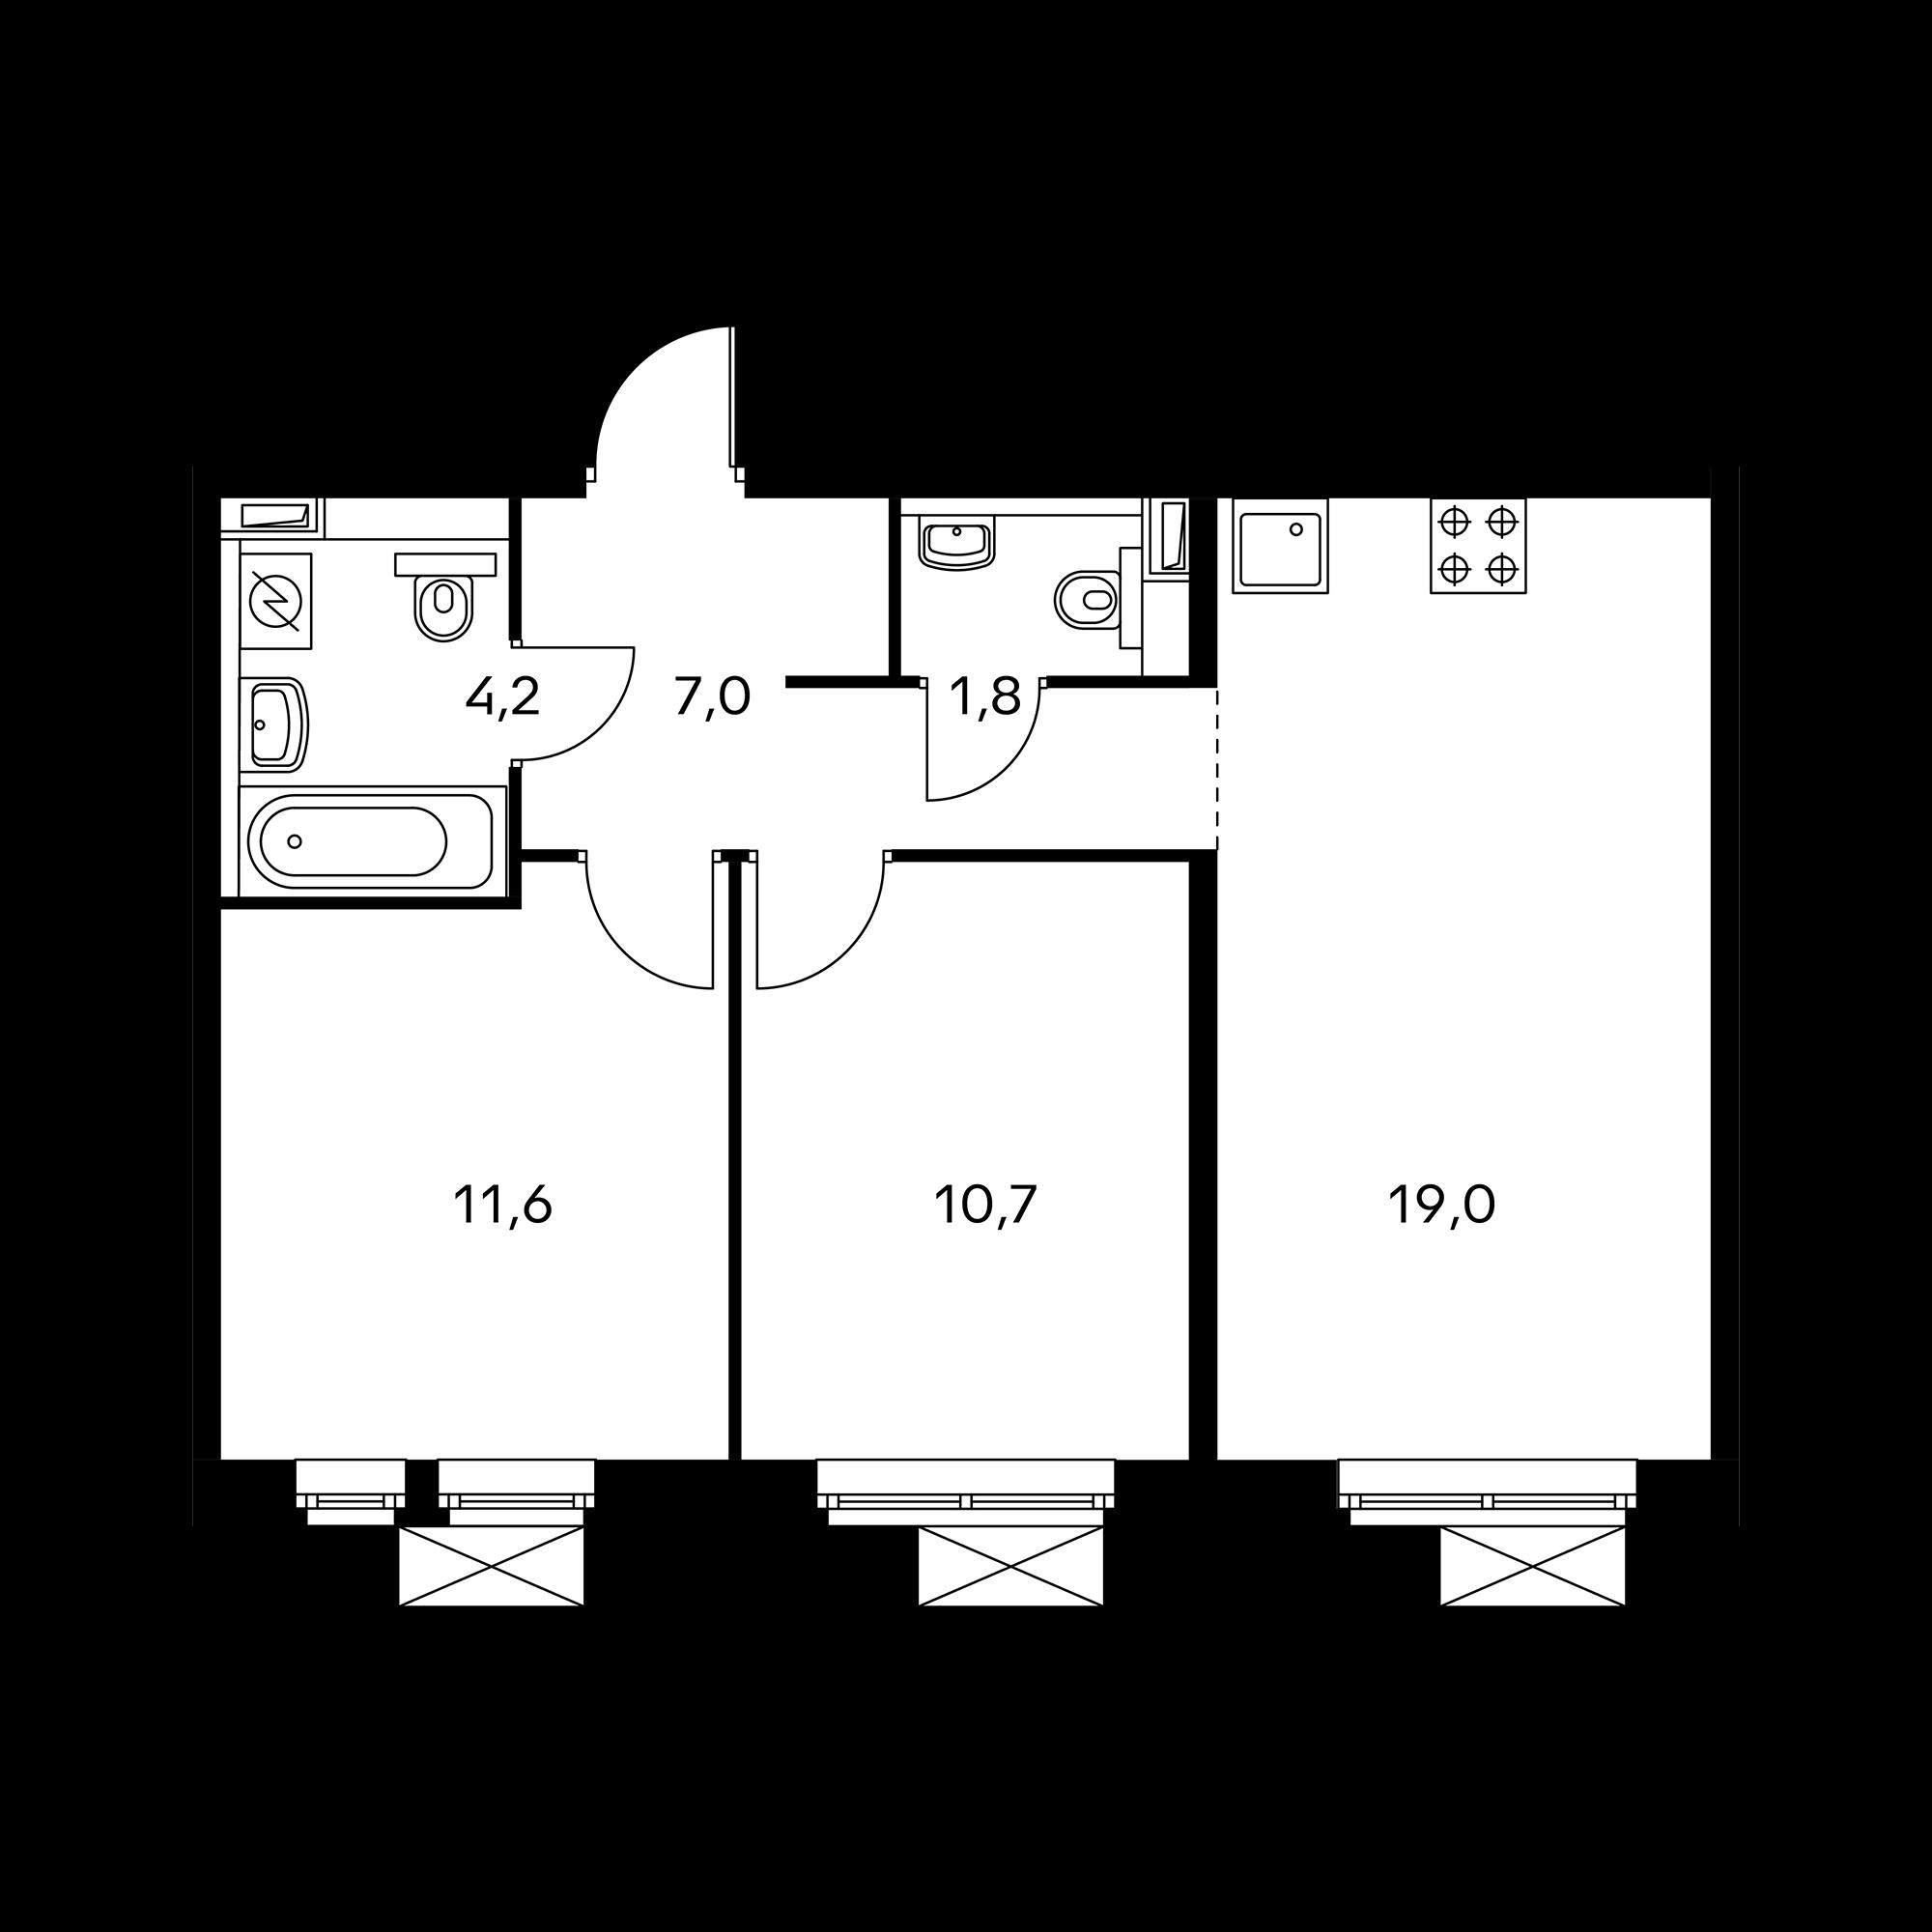 2ES8_9.6-1_2